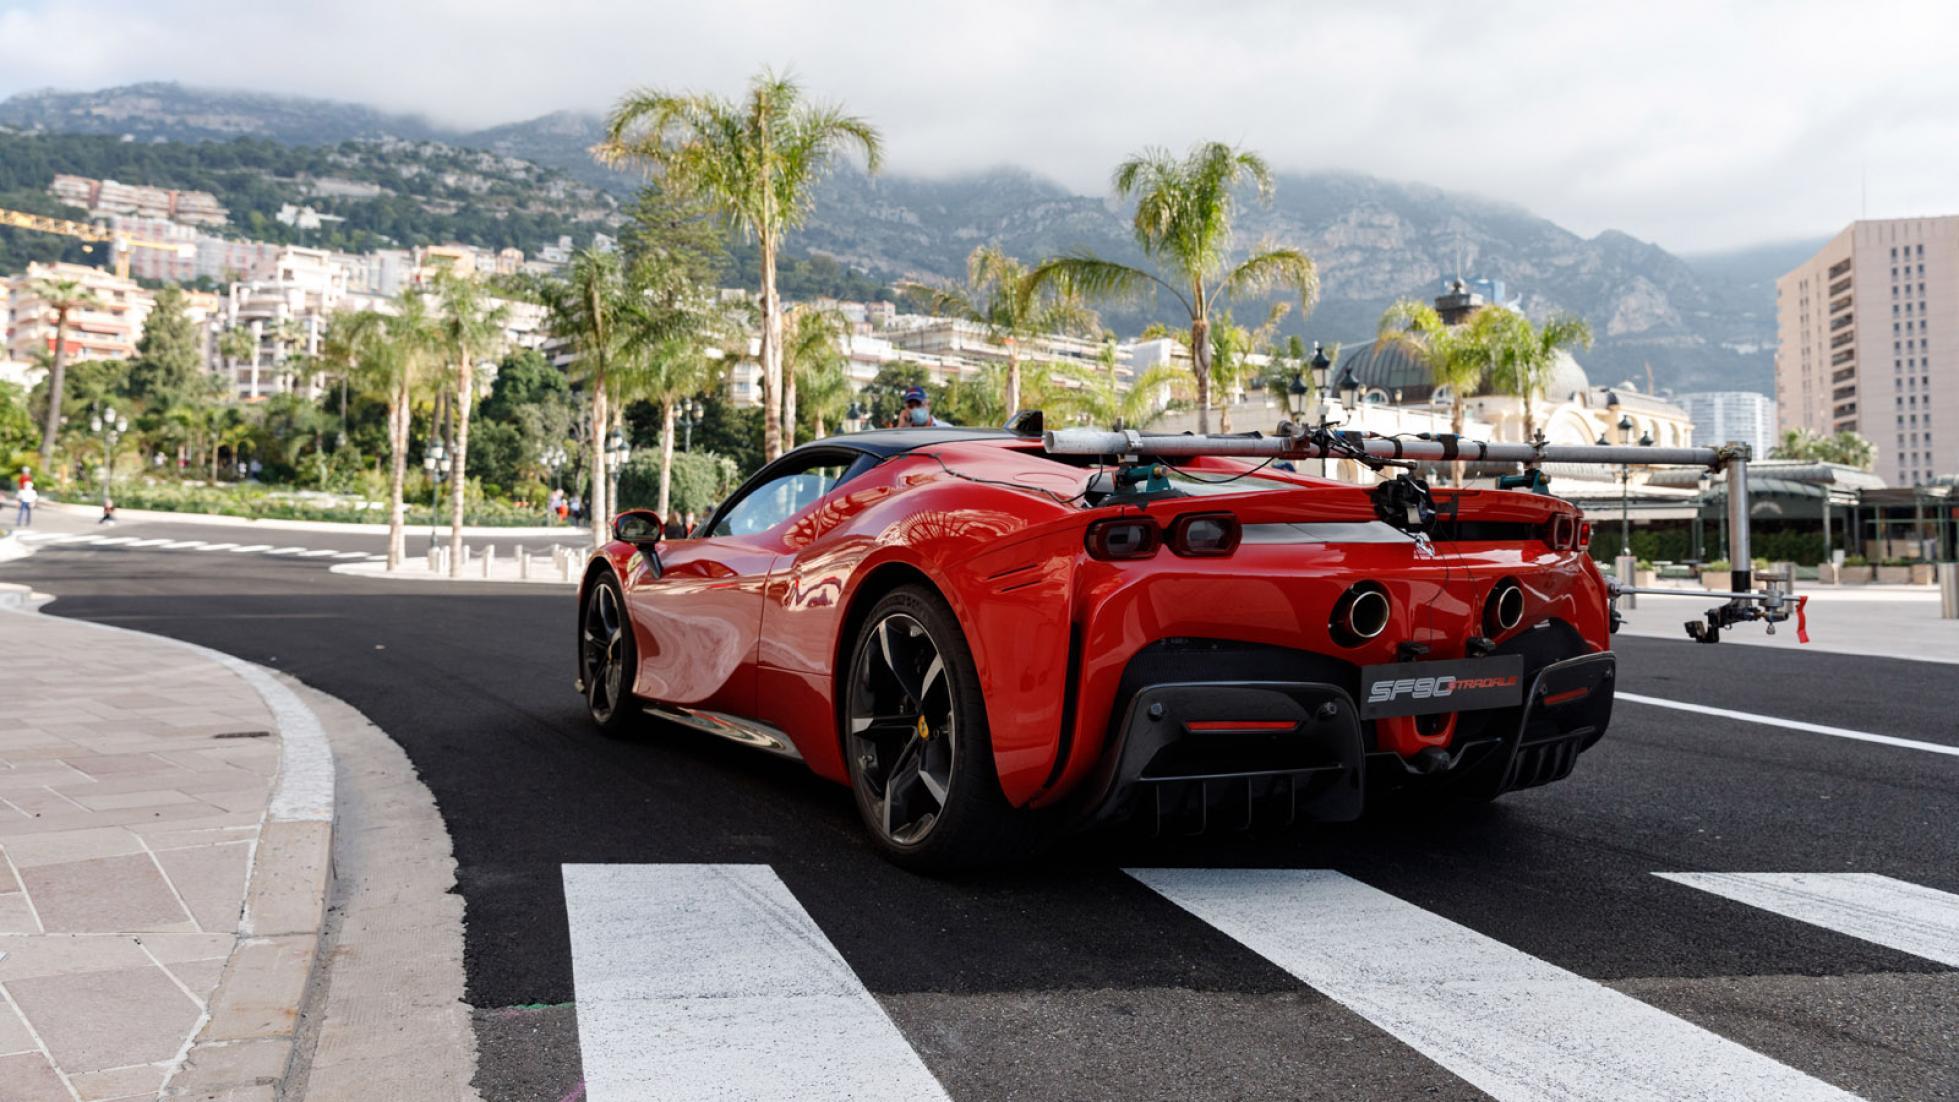 Charles-Leclerc-Ferrari-SF90-Stradale-Monaco-11